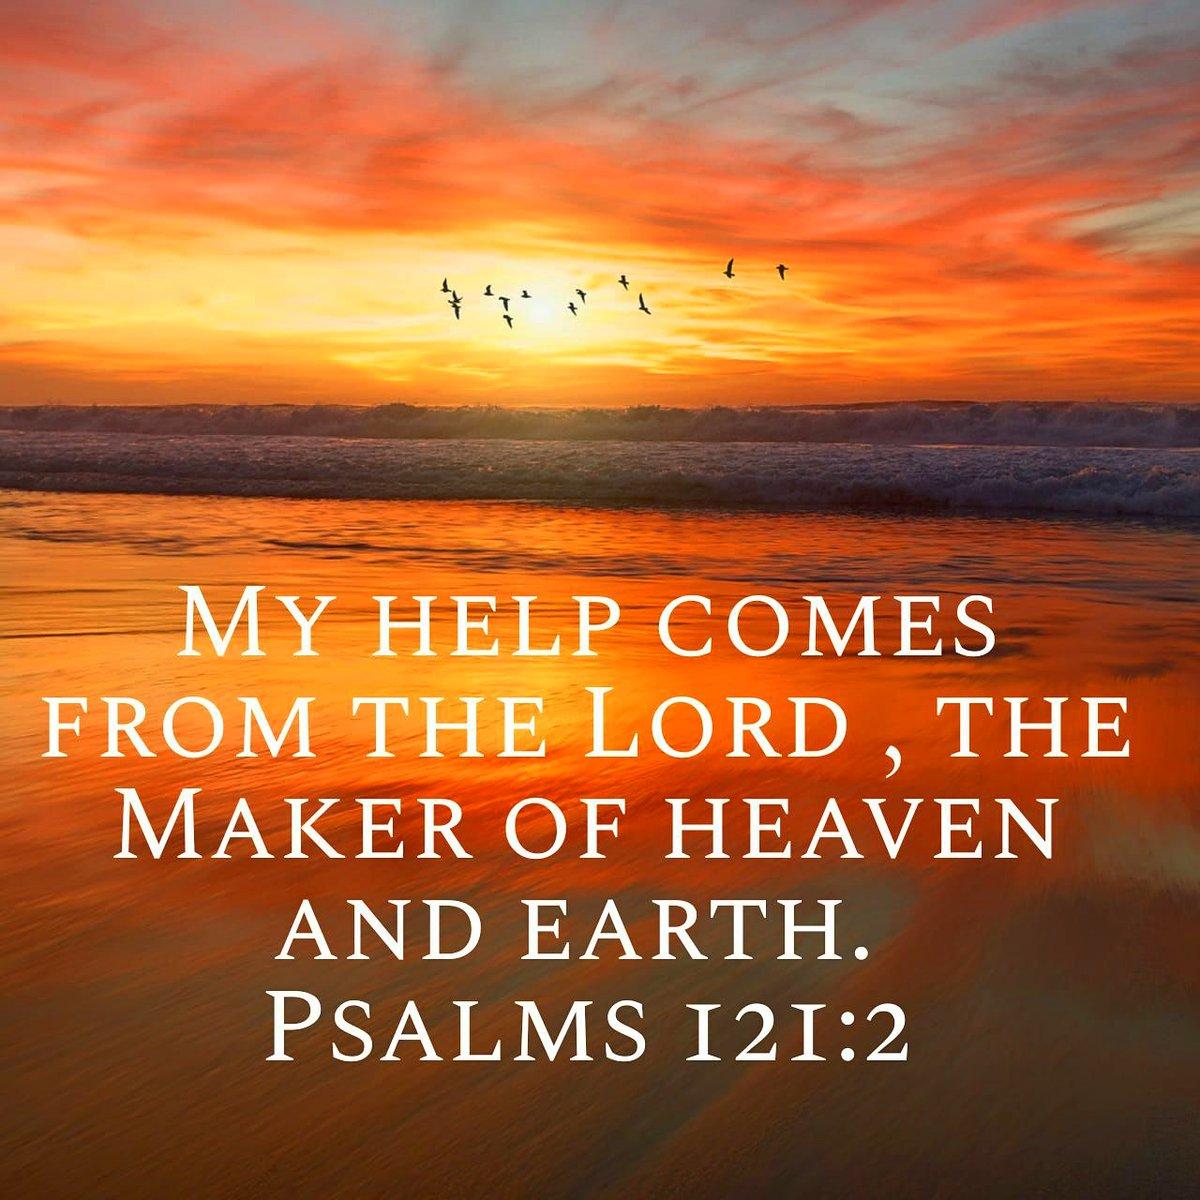 #Jesus #loves #you #Yeshua #yeshuahamashiach #God #Holy #Messiah #Joy #verseoftheday #votd #Truth #Word #words of #life #inspiration #Bible #inspiration #peace #hope #love #Bibleverse #scripture #Baruch #atah, #Adonai #Eloheinu, #Melech #haolampic.twitter.com/rcBOkyhV40